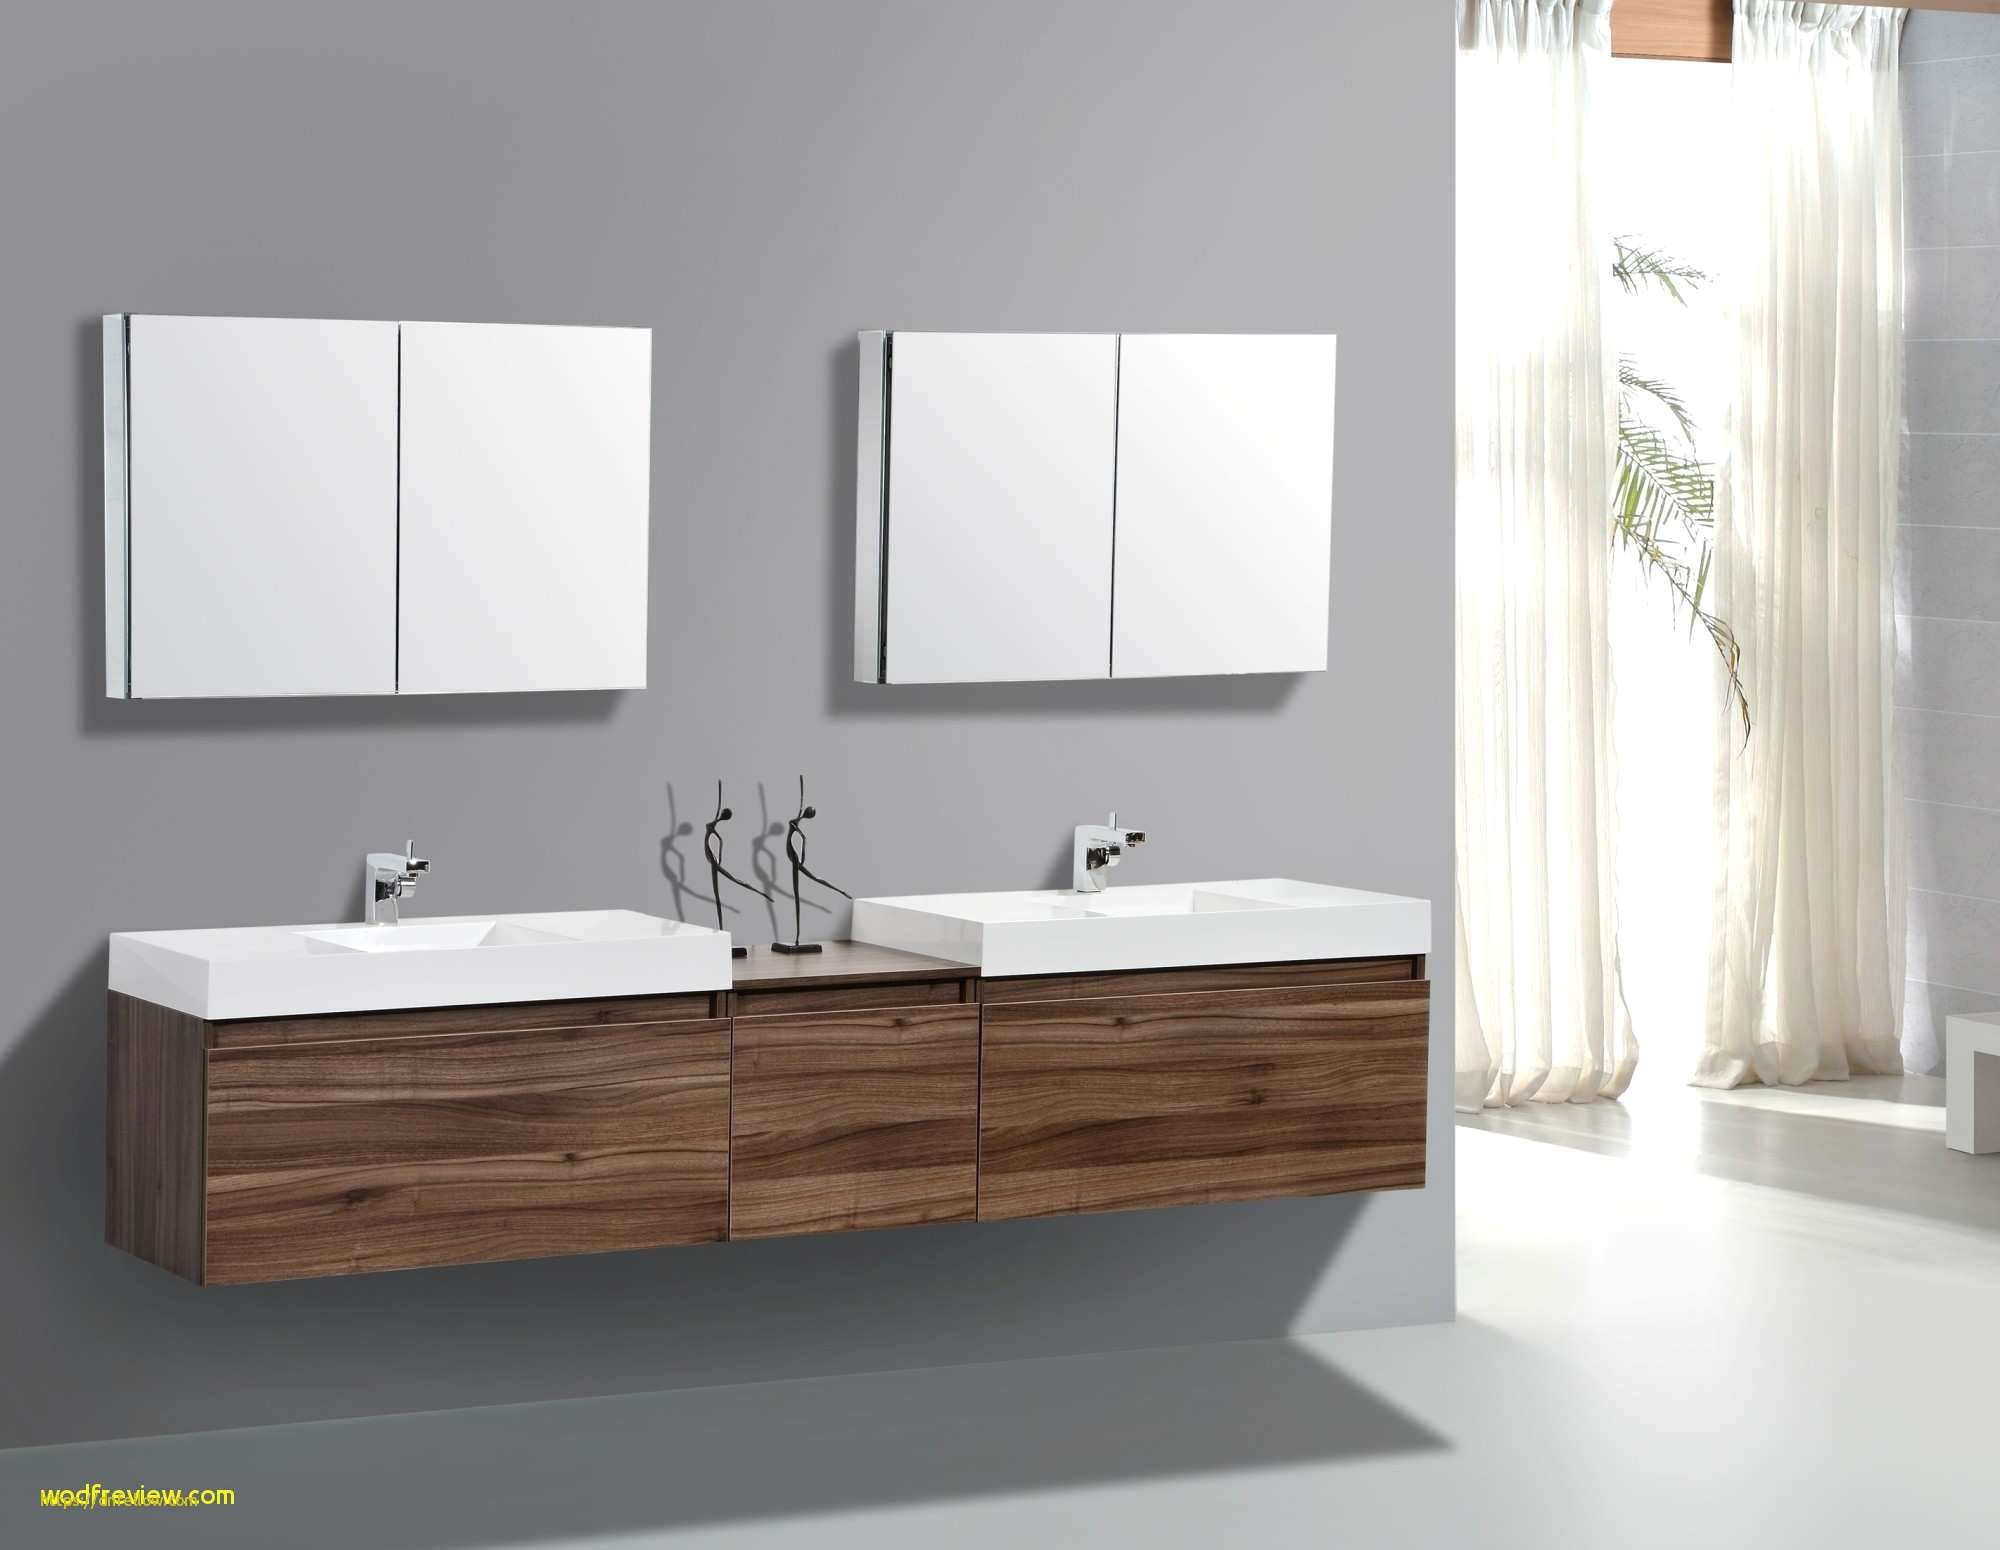 Inspirational Bathroom Design Mistakes Https Dnfellow Com Home Depot Beautiful Led